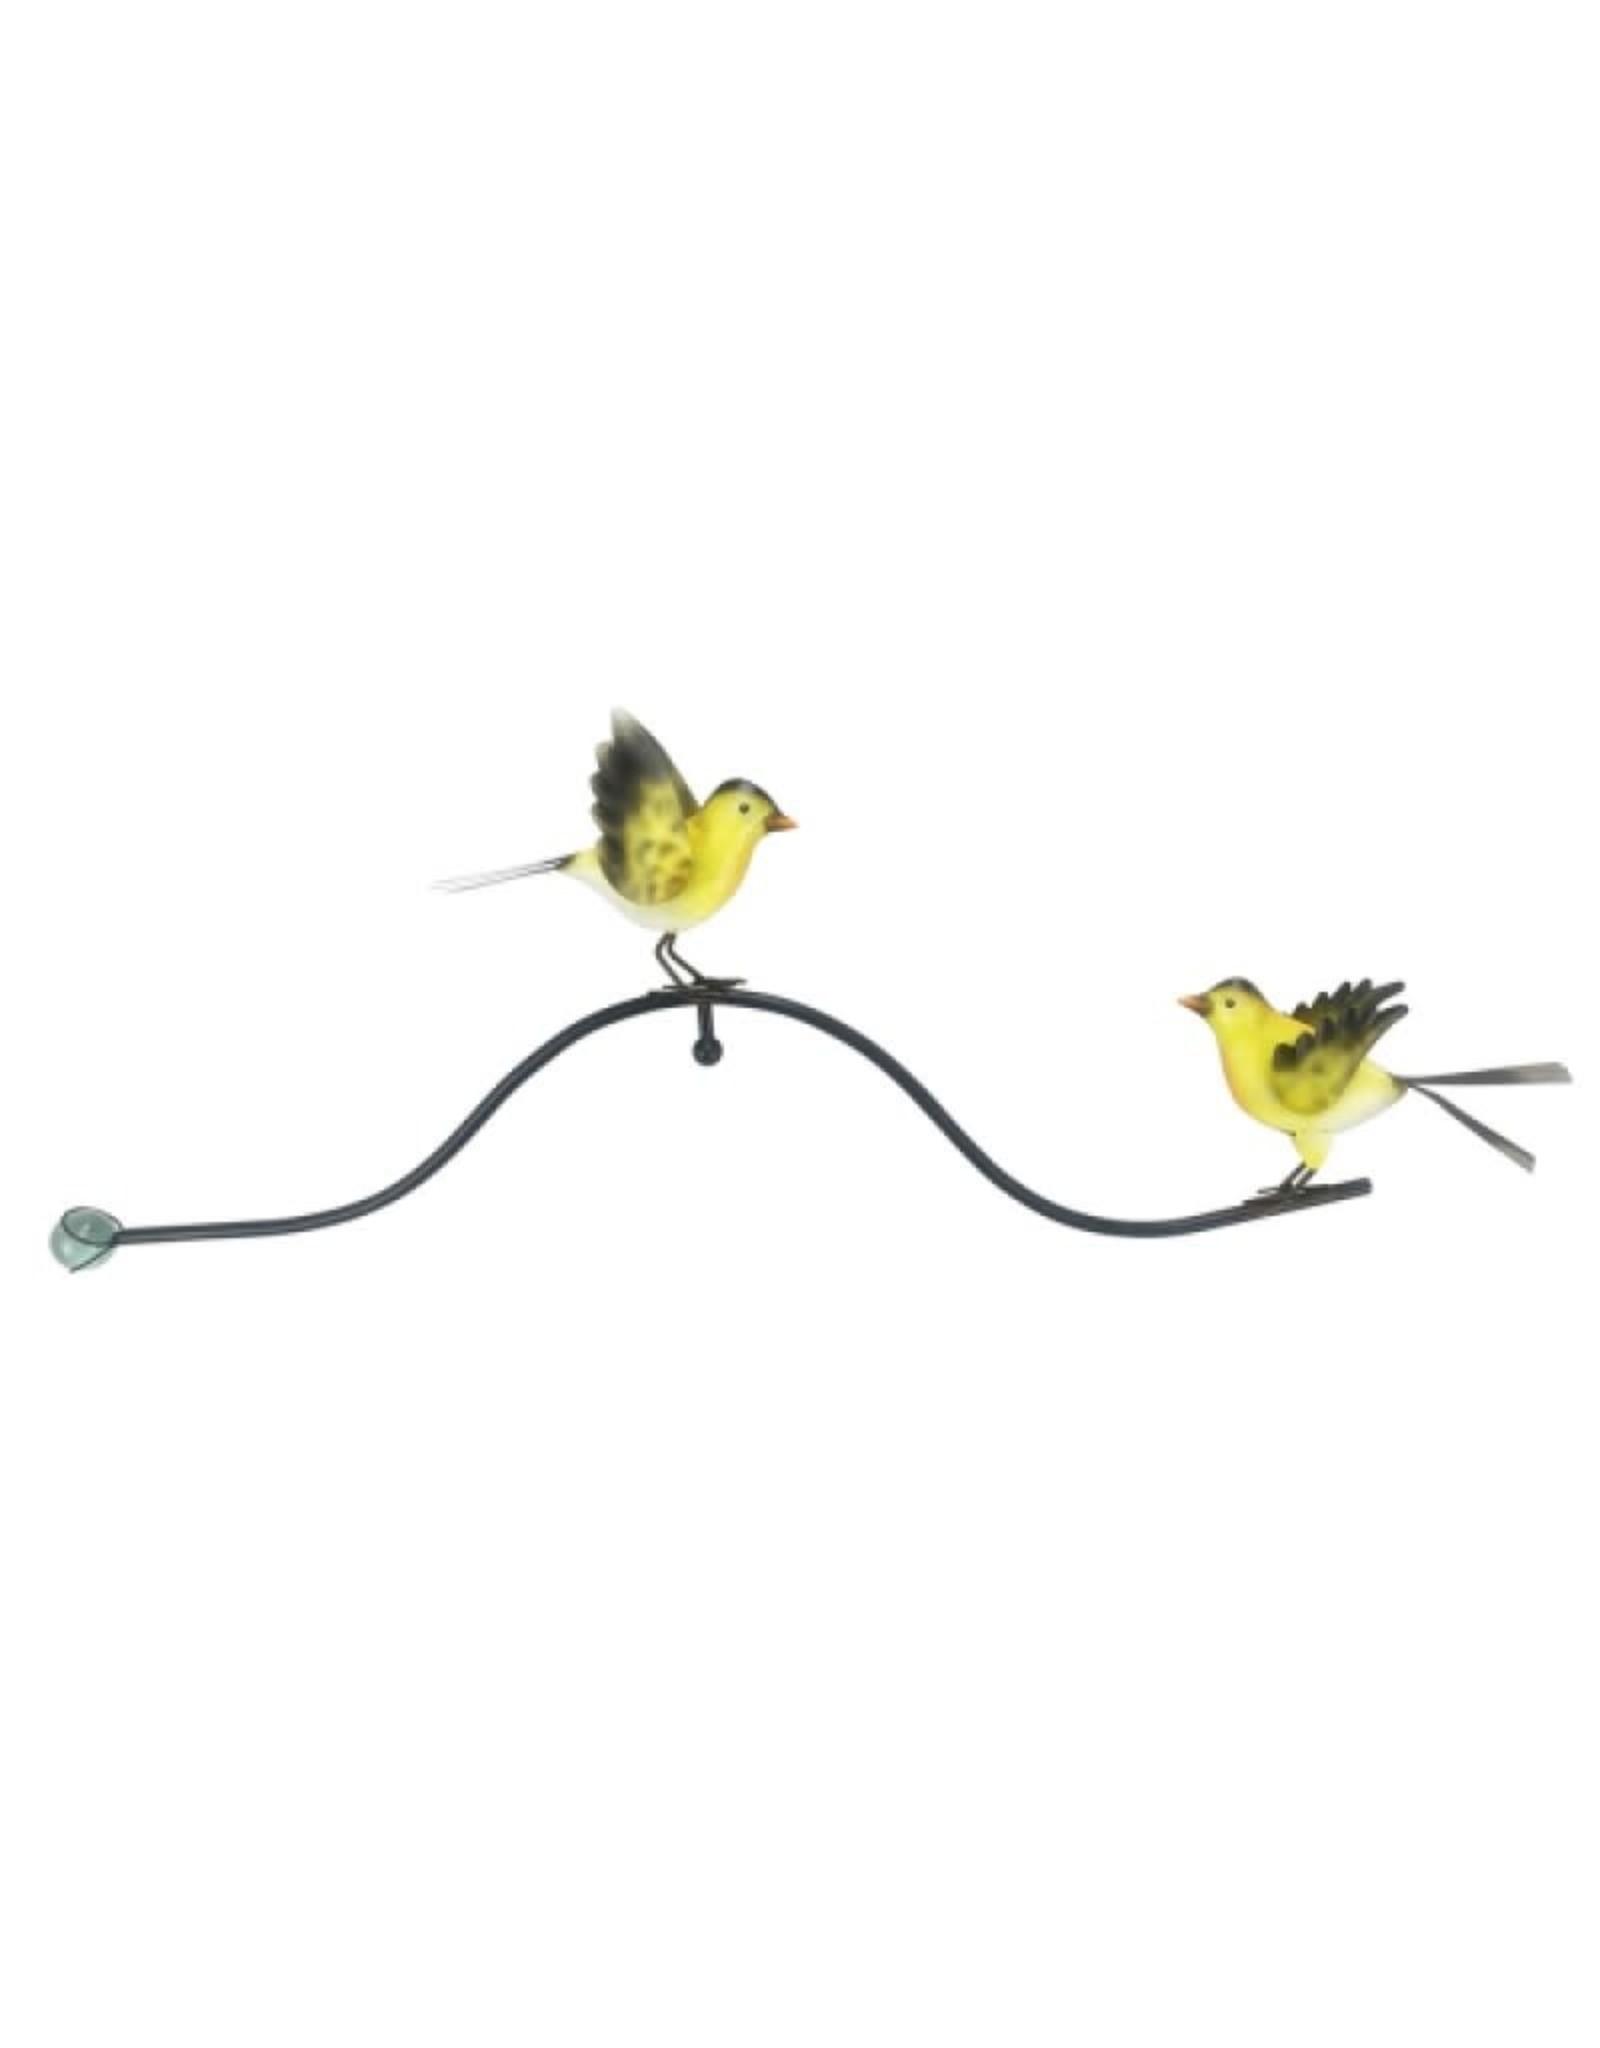 Balancer - Fluttering Finch